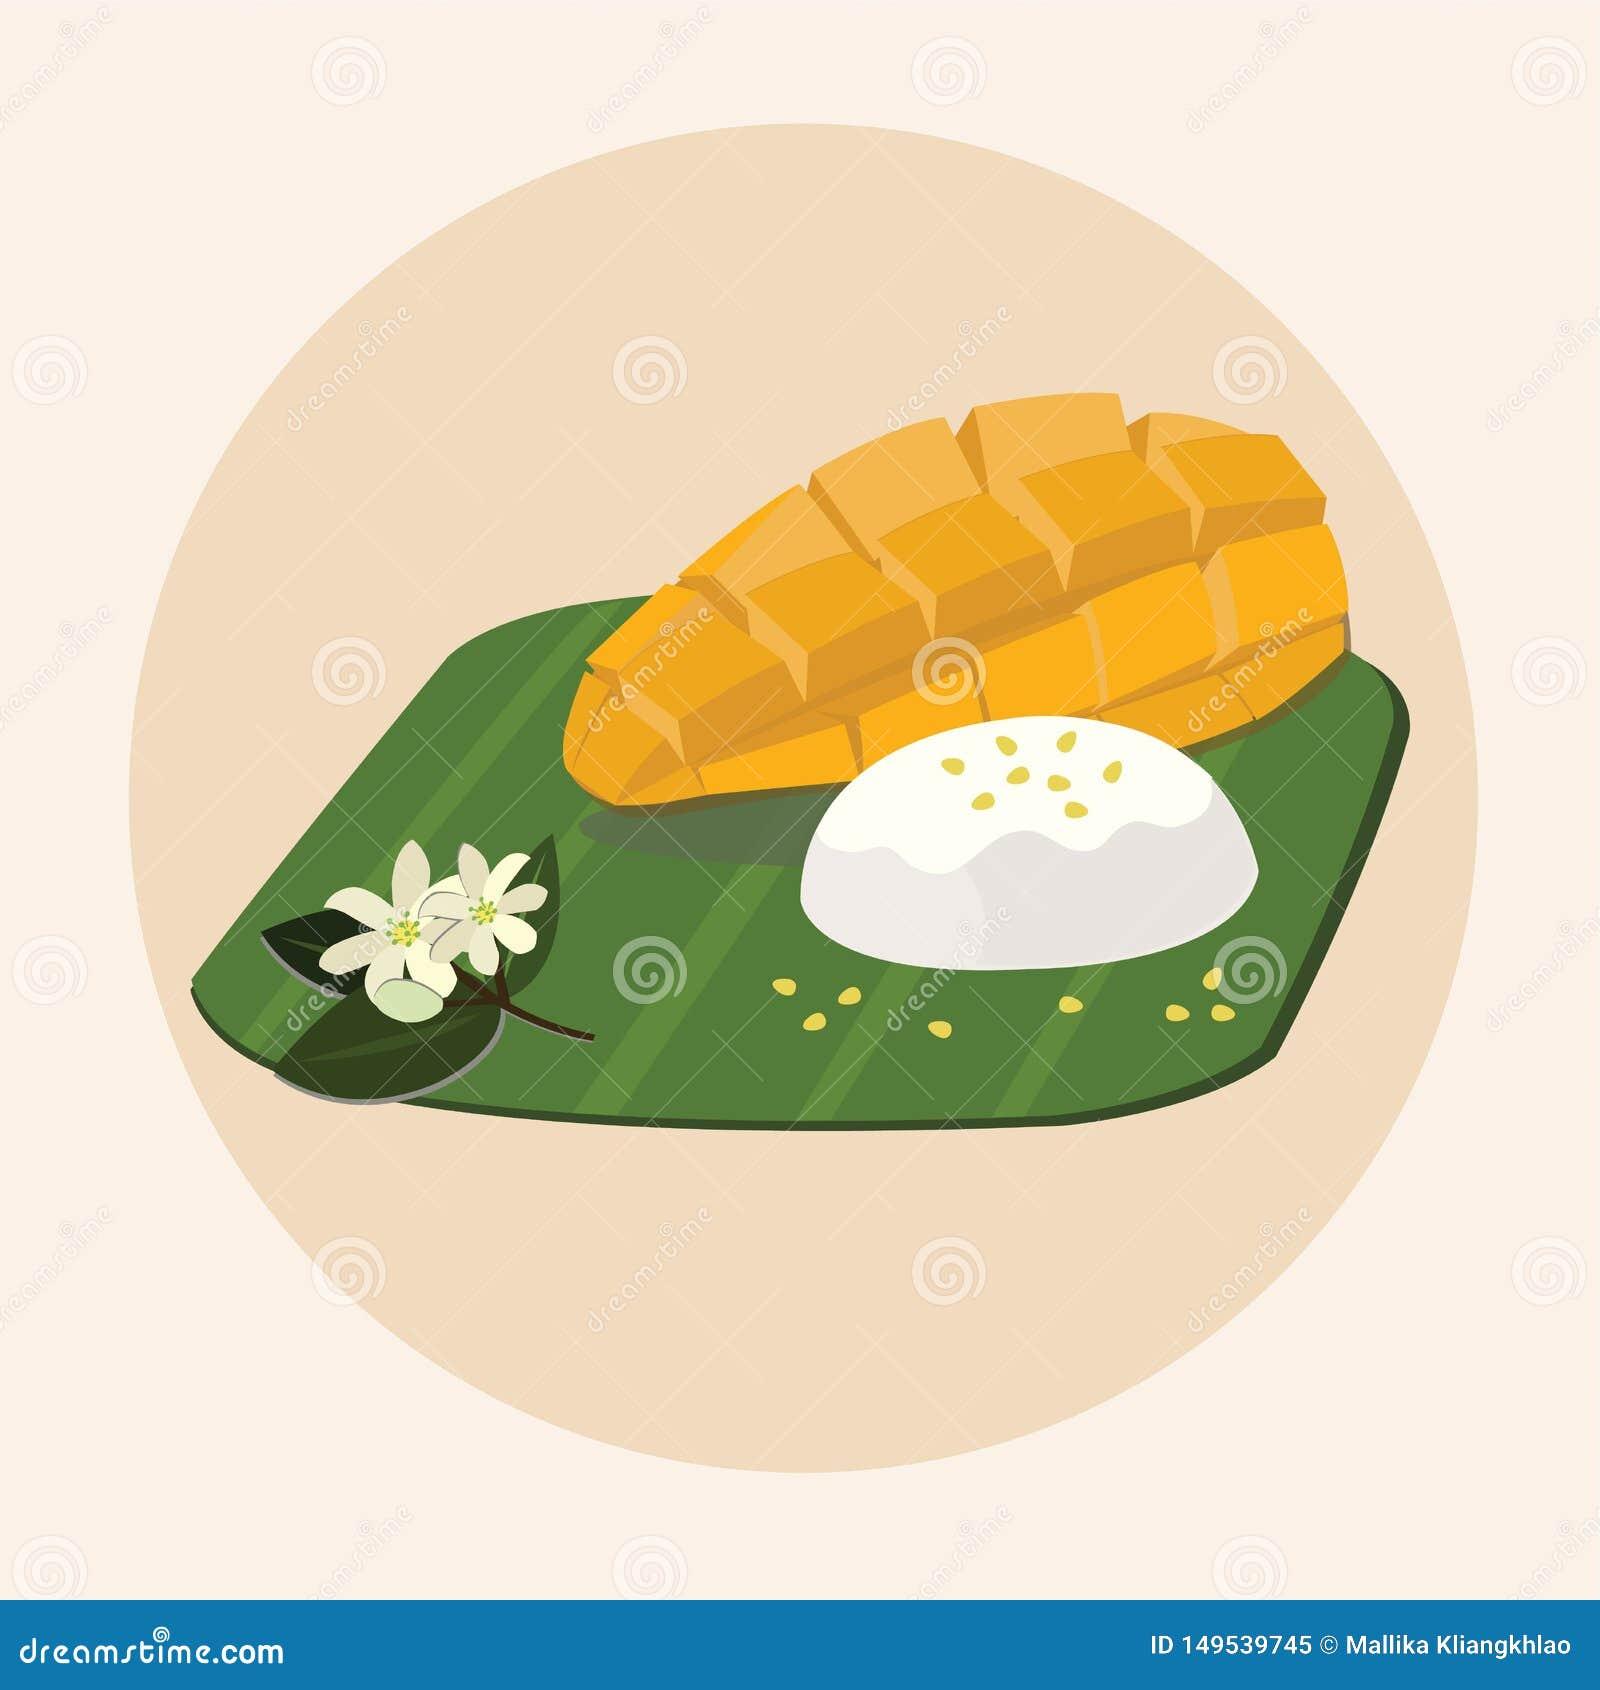 Khao Niew mA Muang - arroz pegajoso dulce tailand?s con el mango